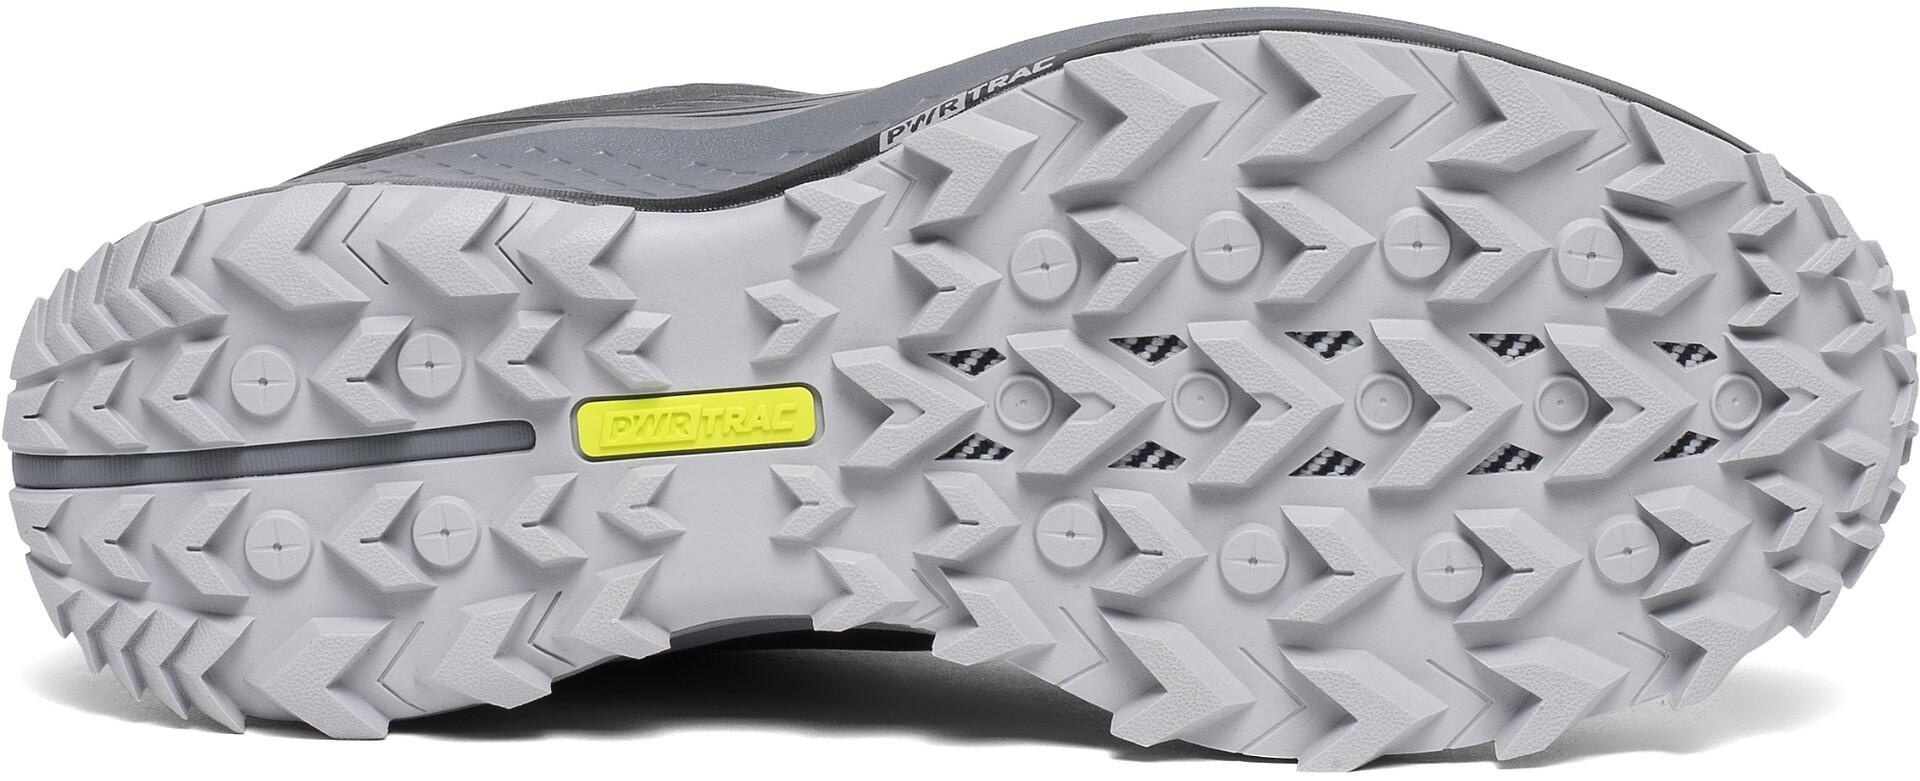 Saucony Peregrine 10 GTX Trail Running Shoe greyblack